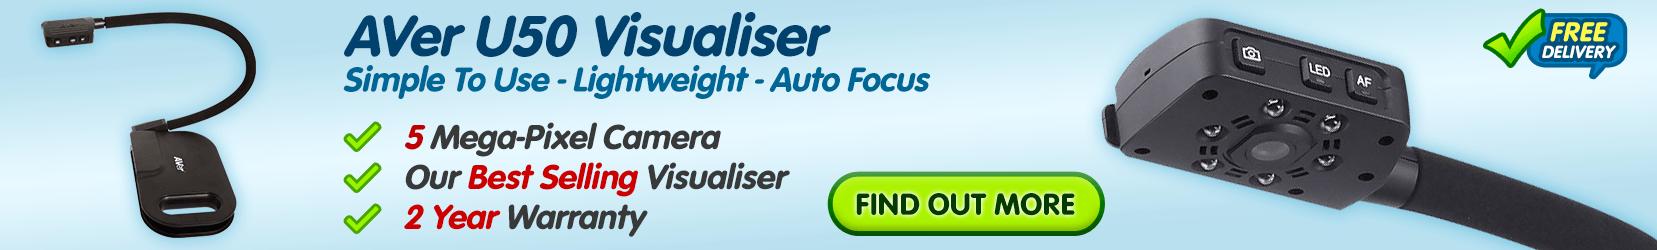 AVer U50 Visualiser - Simple to Use, Lightweight, Auto Focus